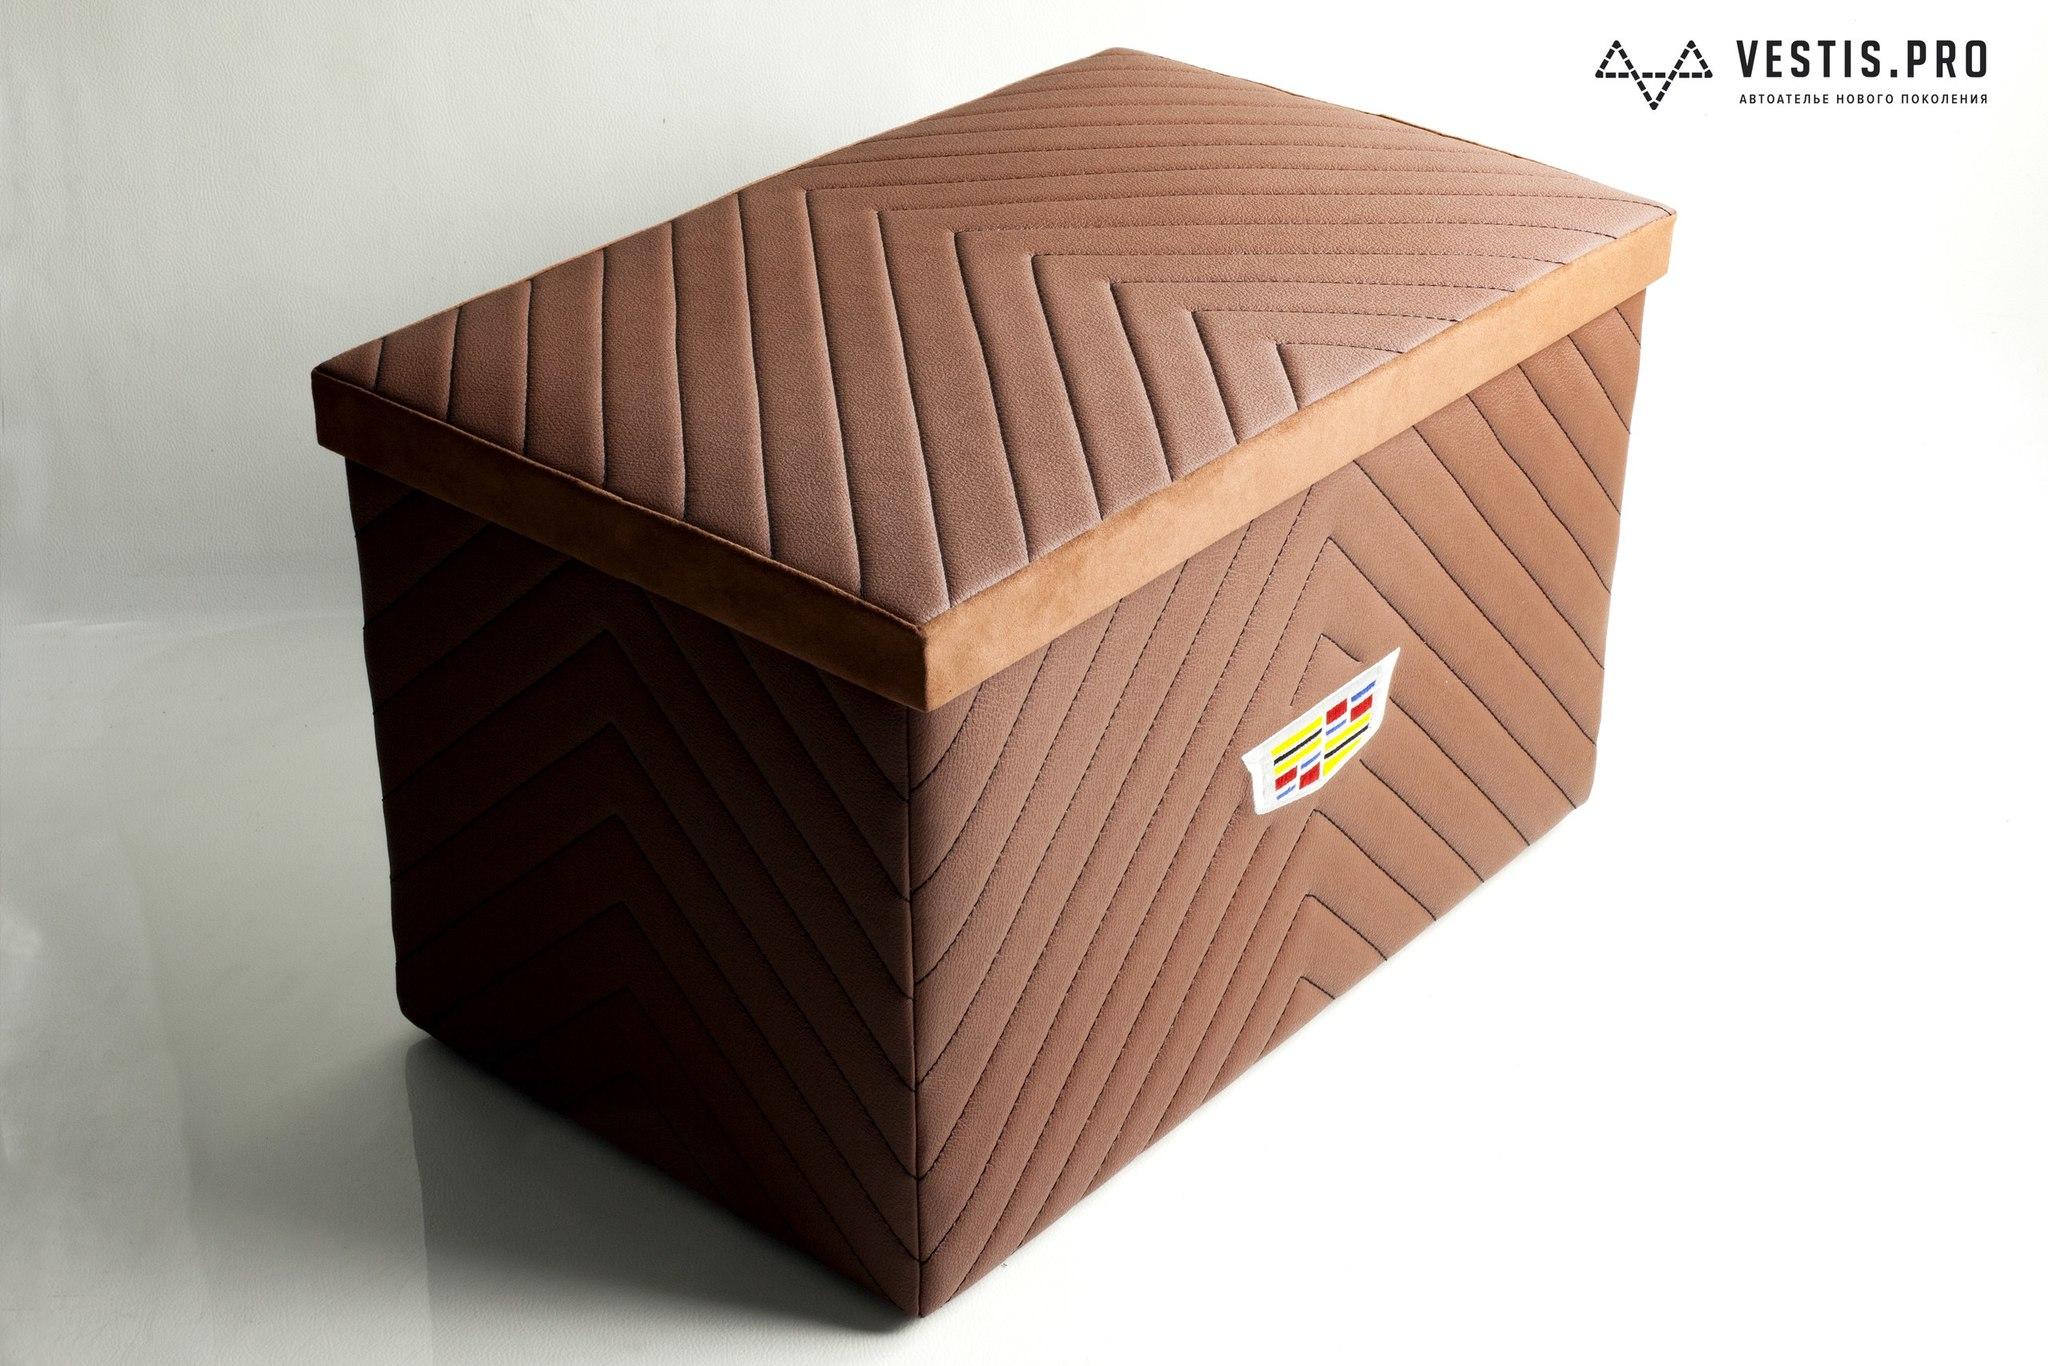 Короб в багажник Vestis